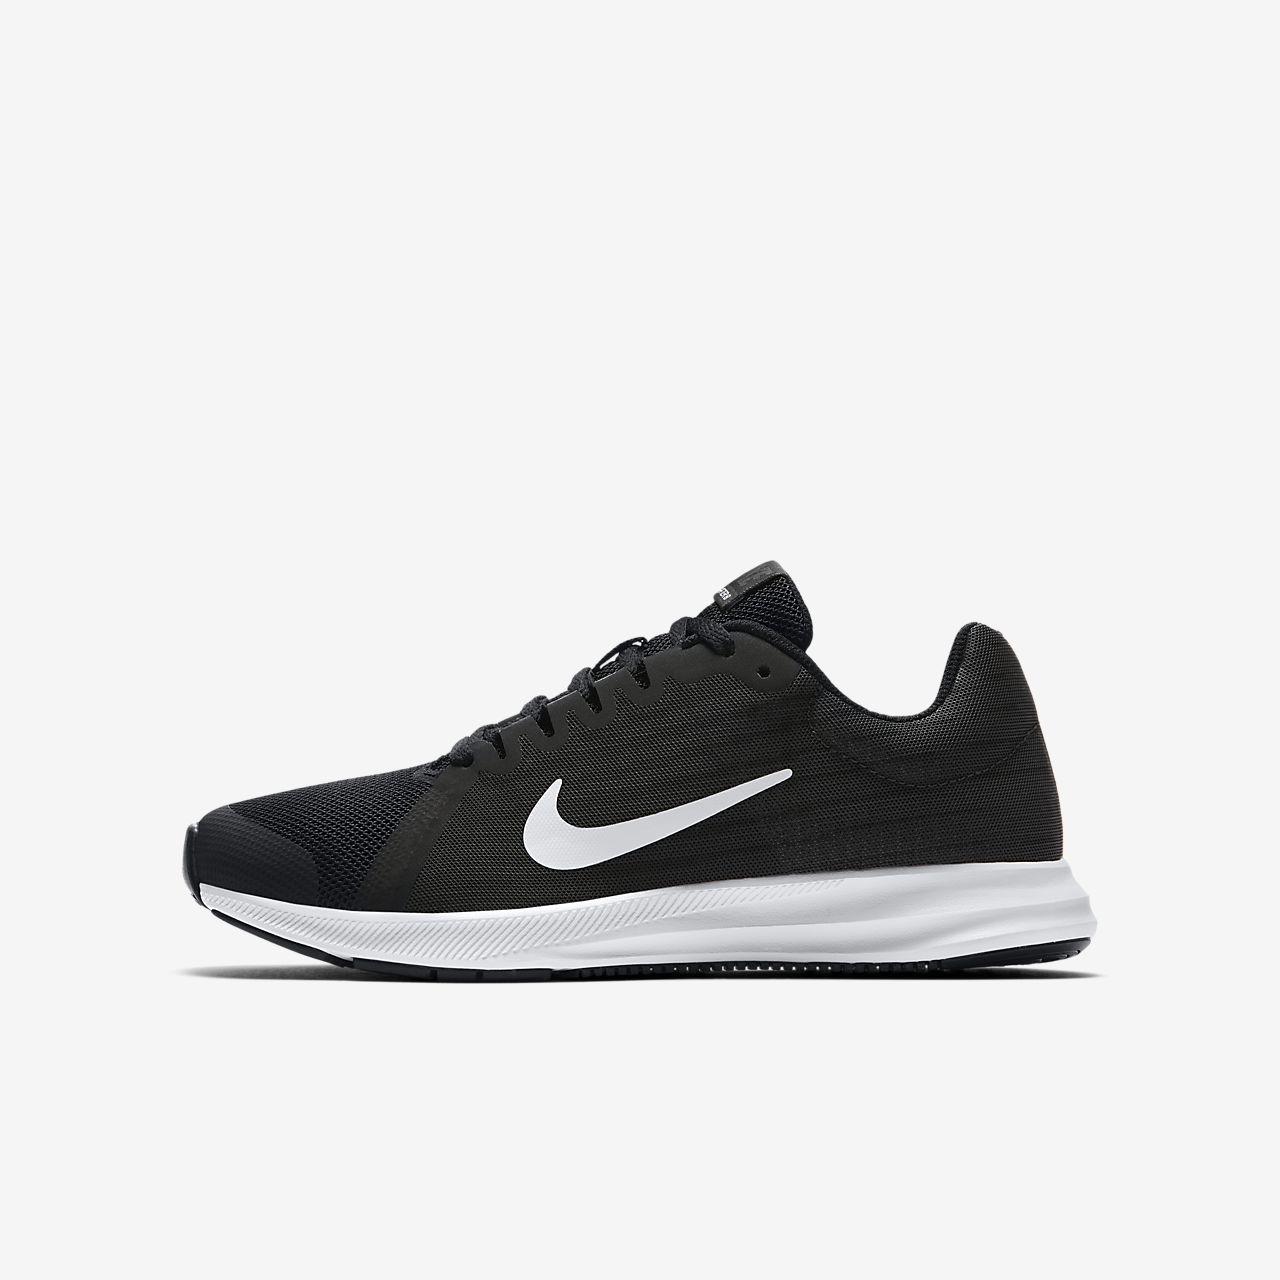 98ca7d9aa2fbd Nike Downshifter 8 Older Kids  (Boys ) Running Shoe. Nike.com GB